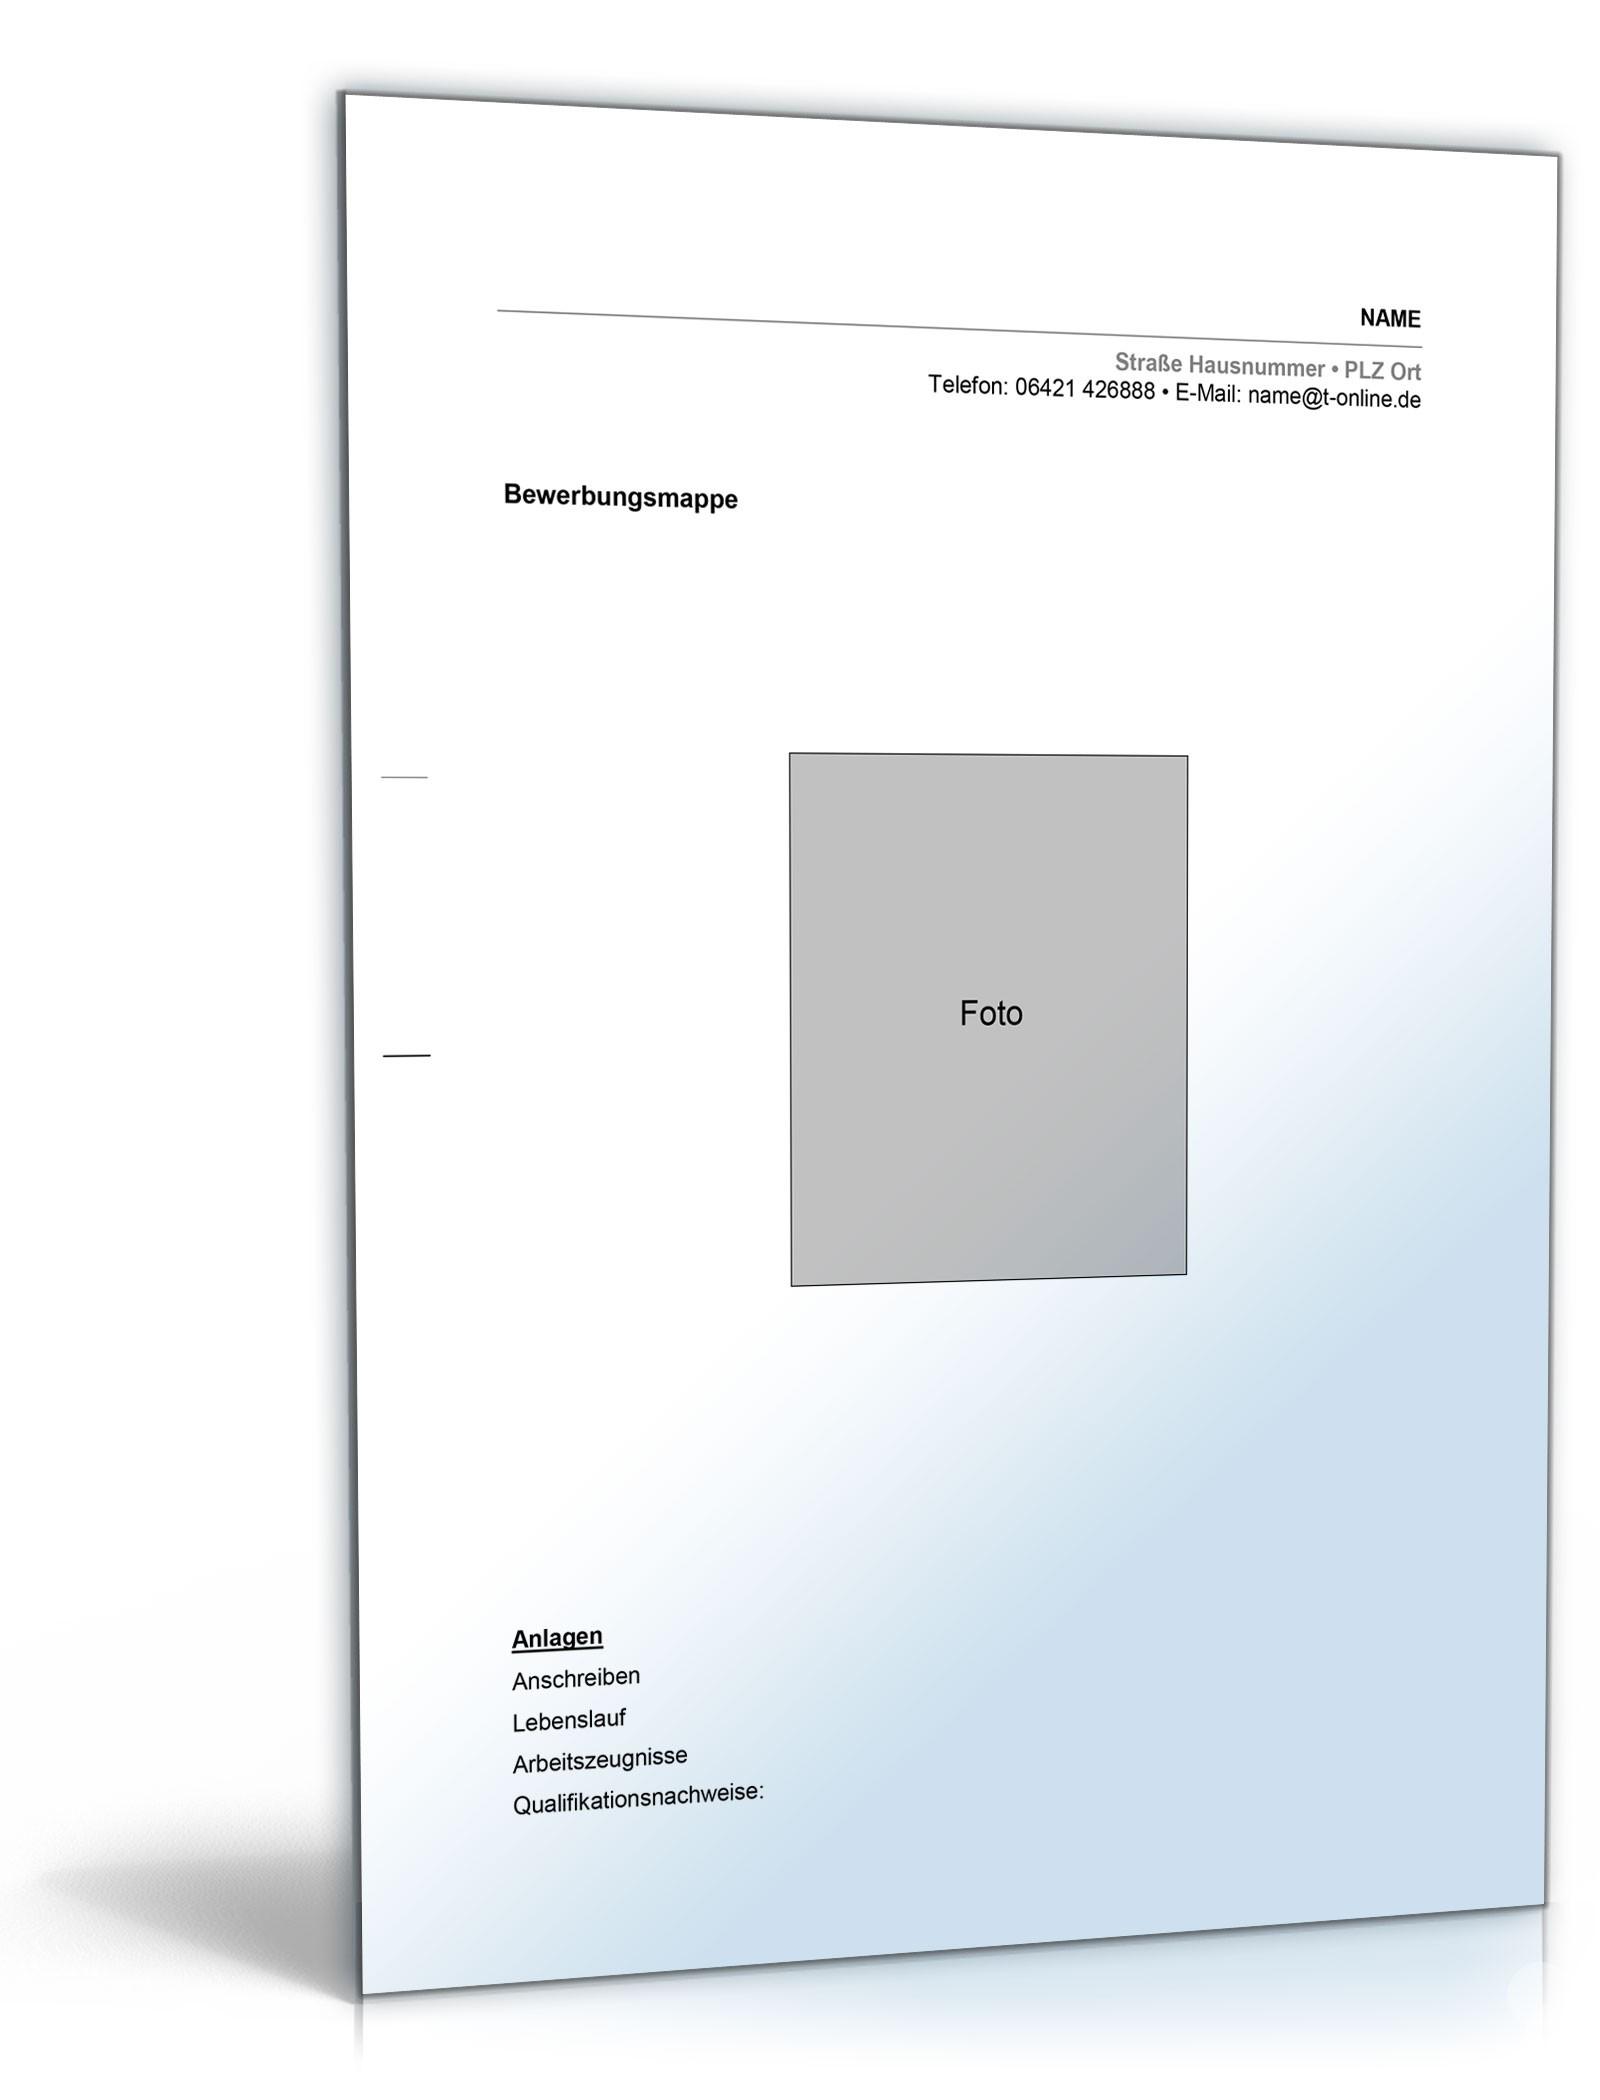 Bewerbungs-Paket Gärtner | Muster zum Download